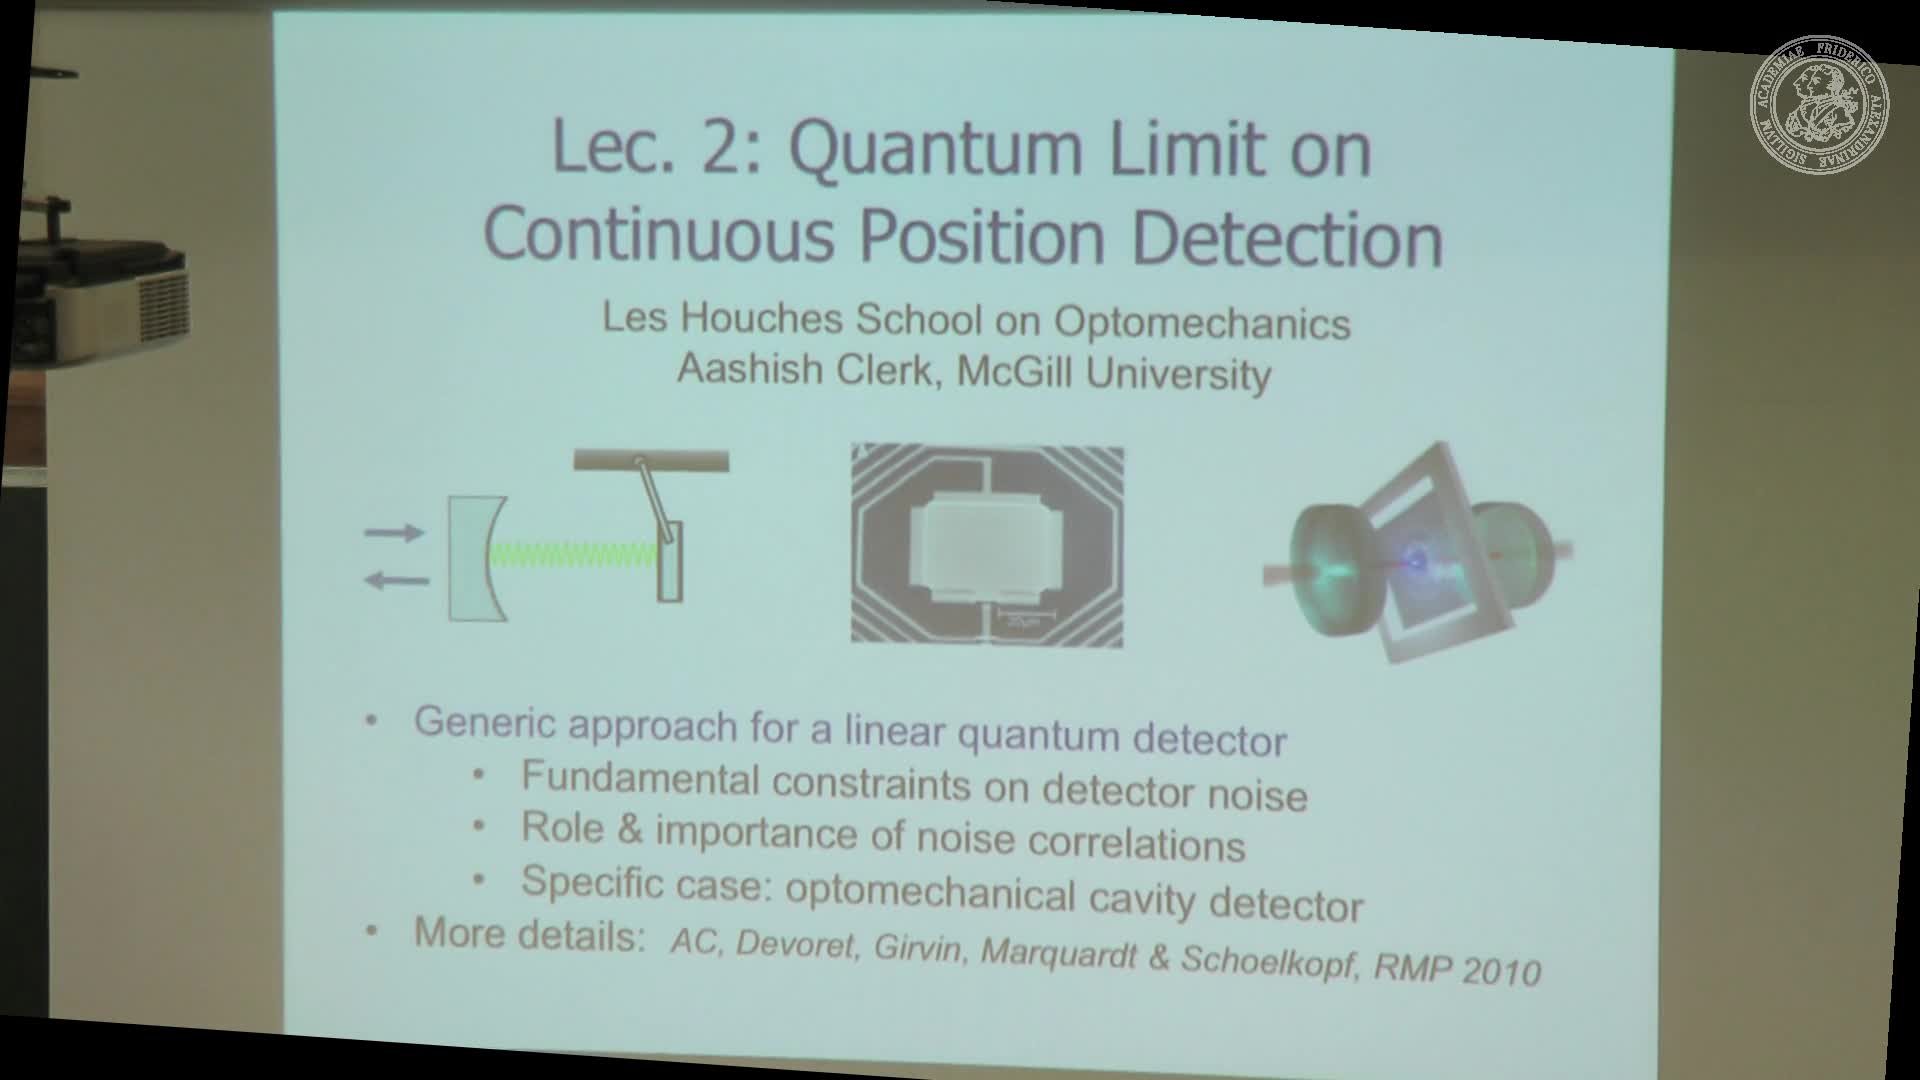 Optomechanics and quantum measurement - 2 preview image